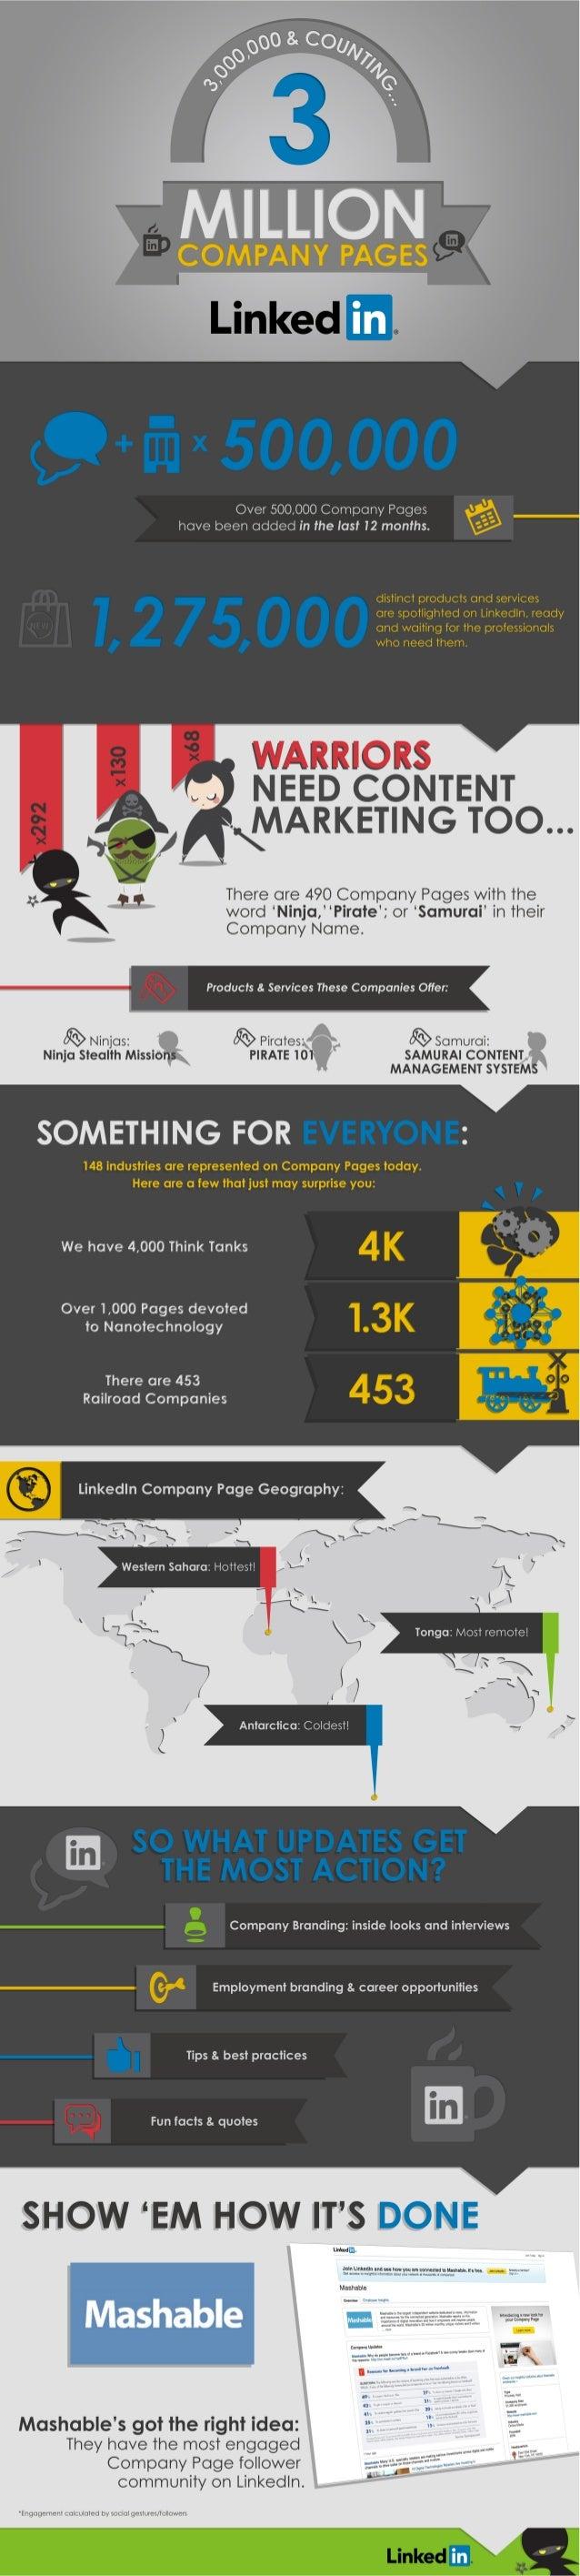 3 Million LinkedIn Company Pages